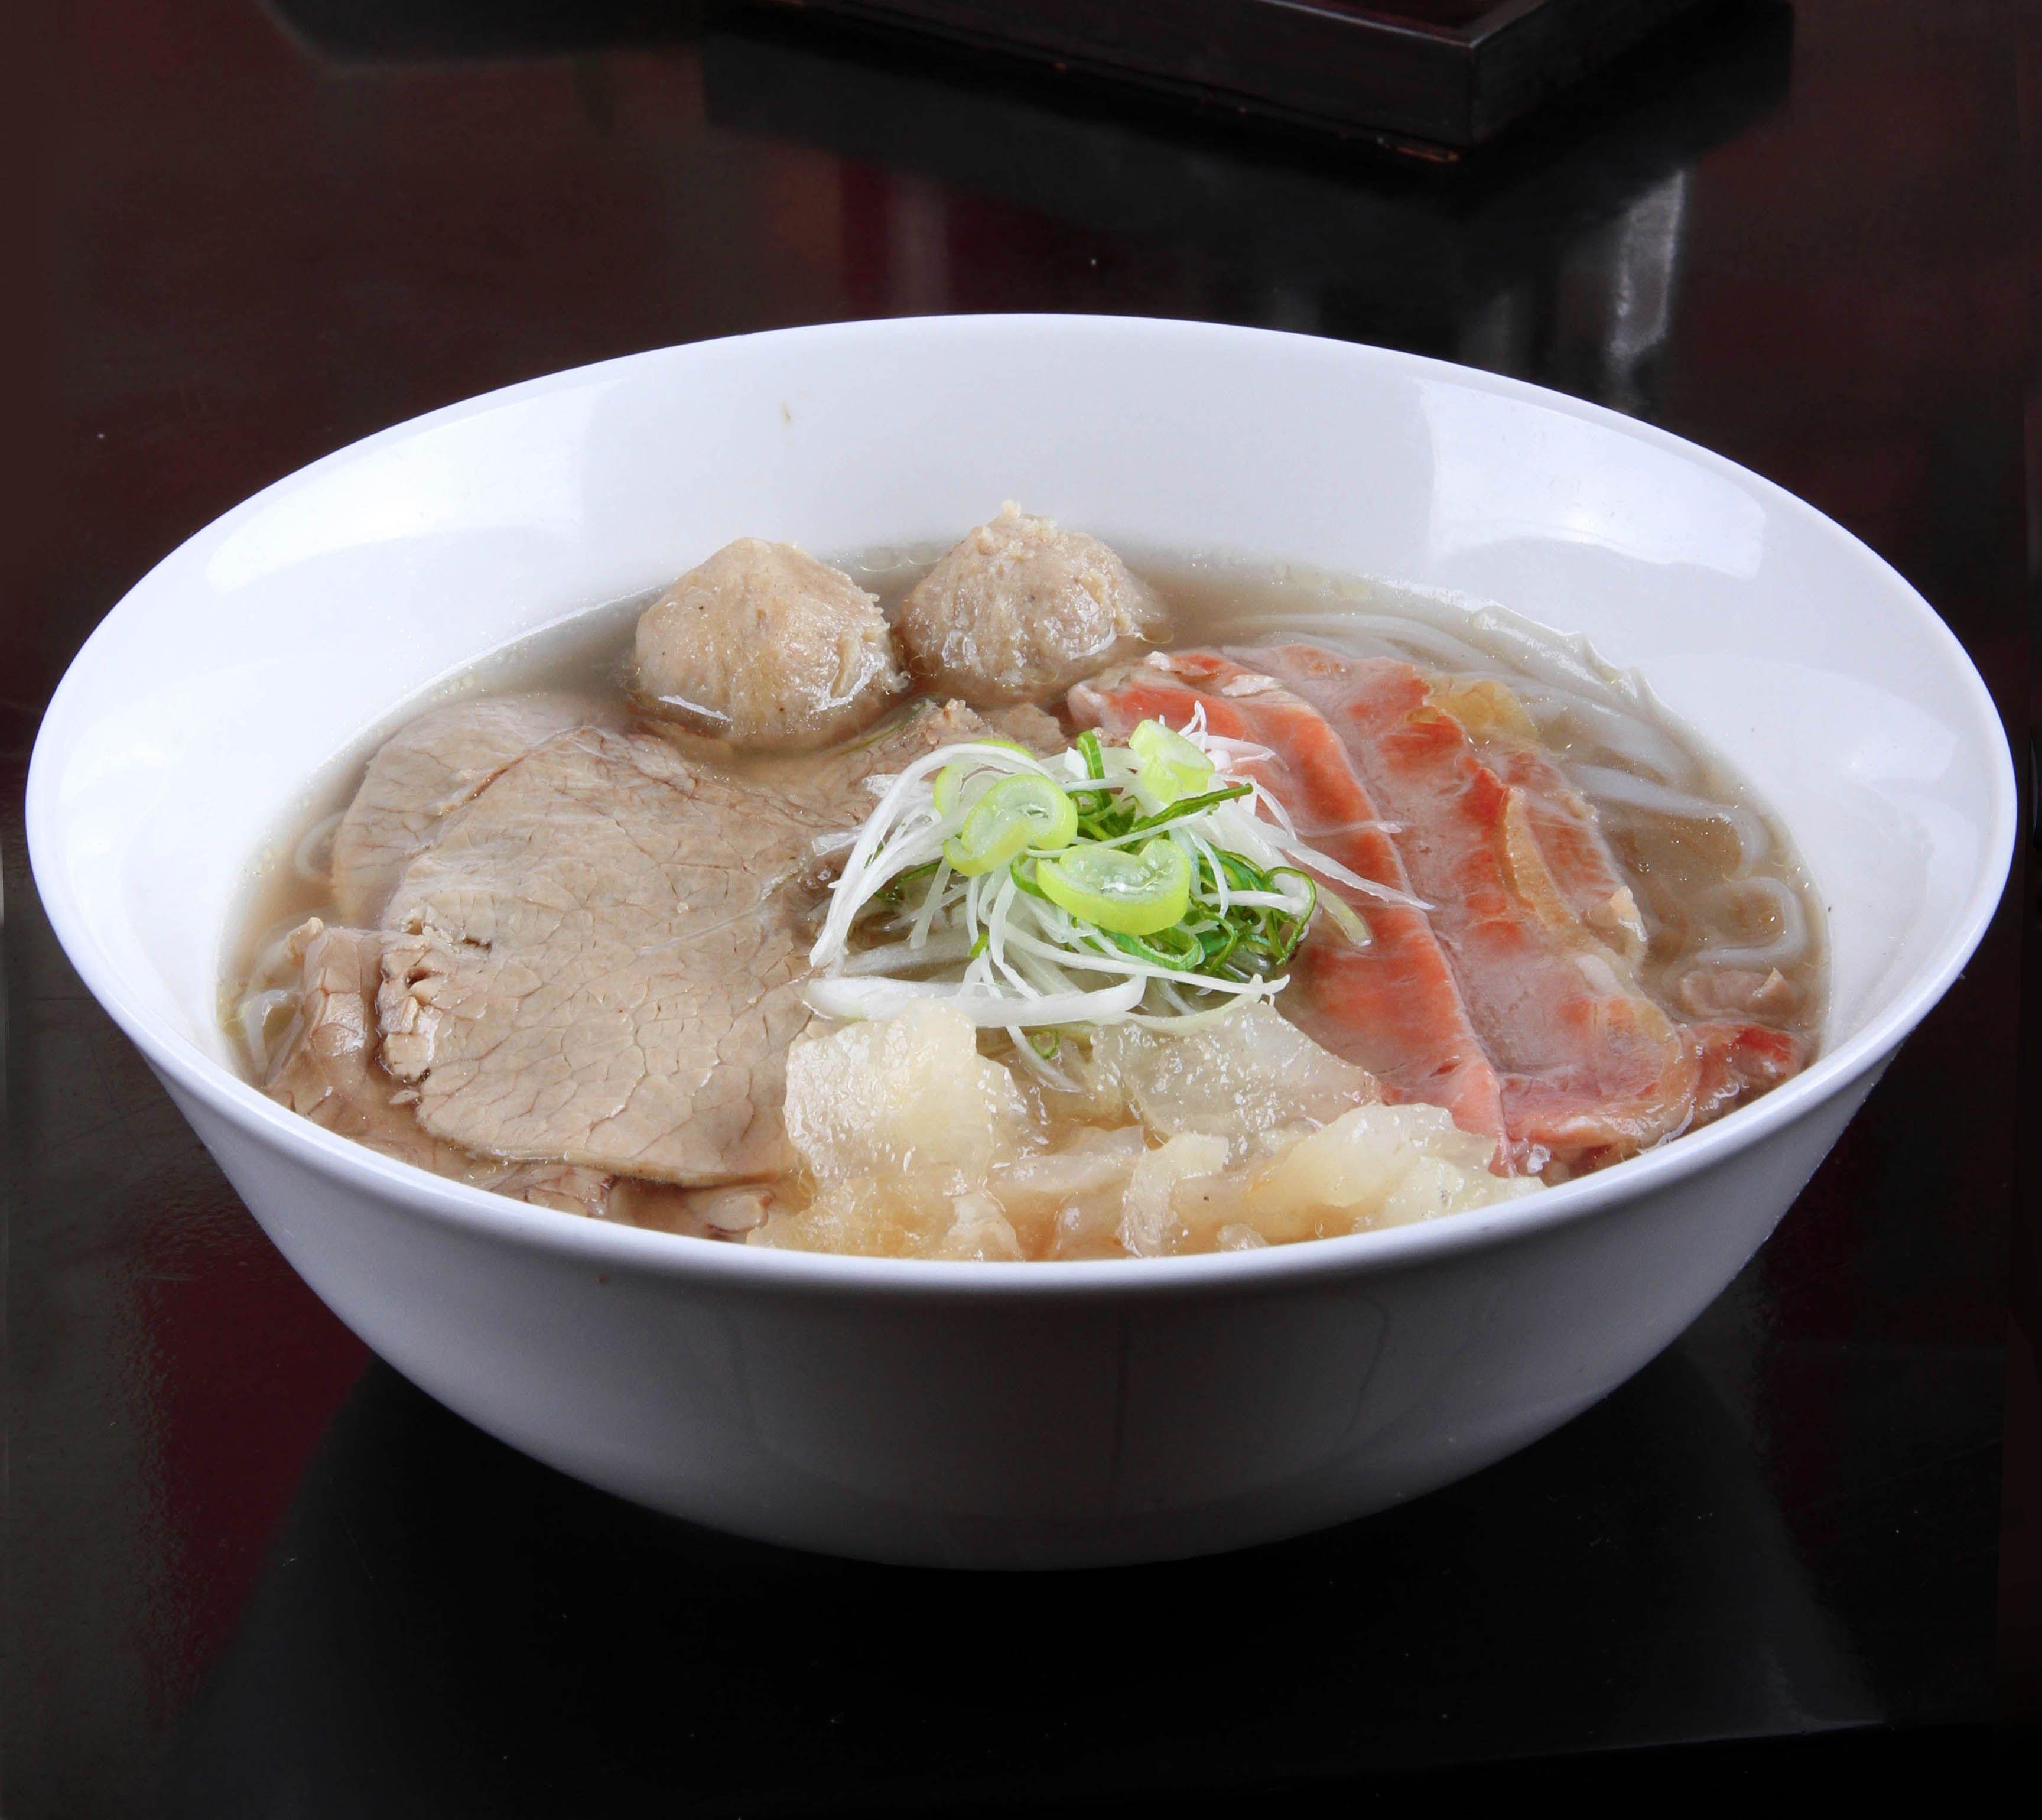 5 Makanan Sehat Khas Vietnam  yang Wajib Kamu Coba di Era Pandemi